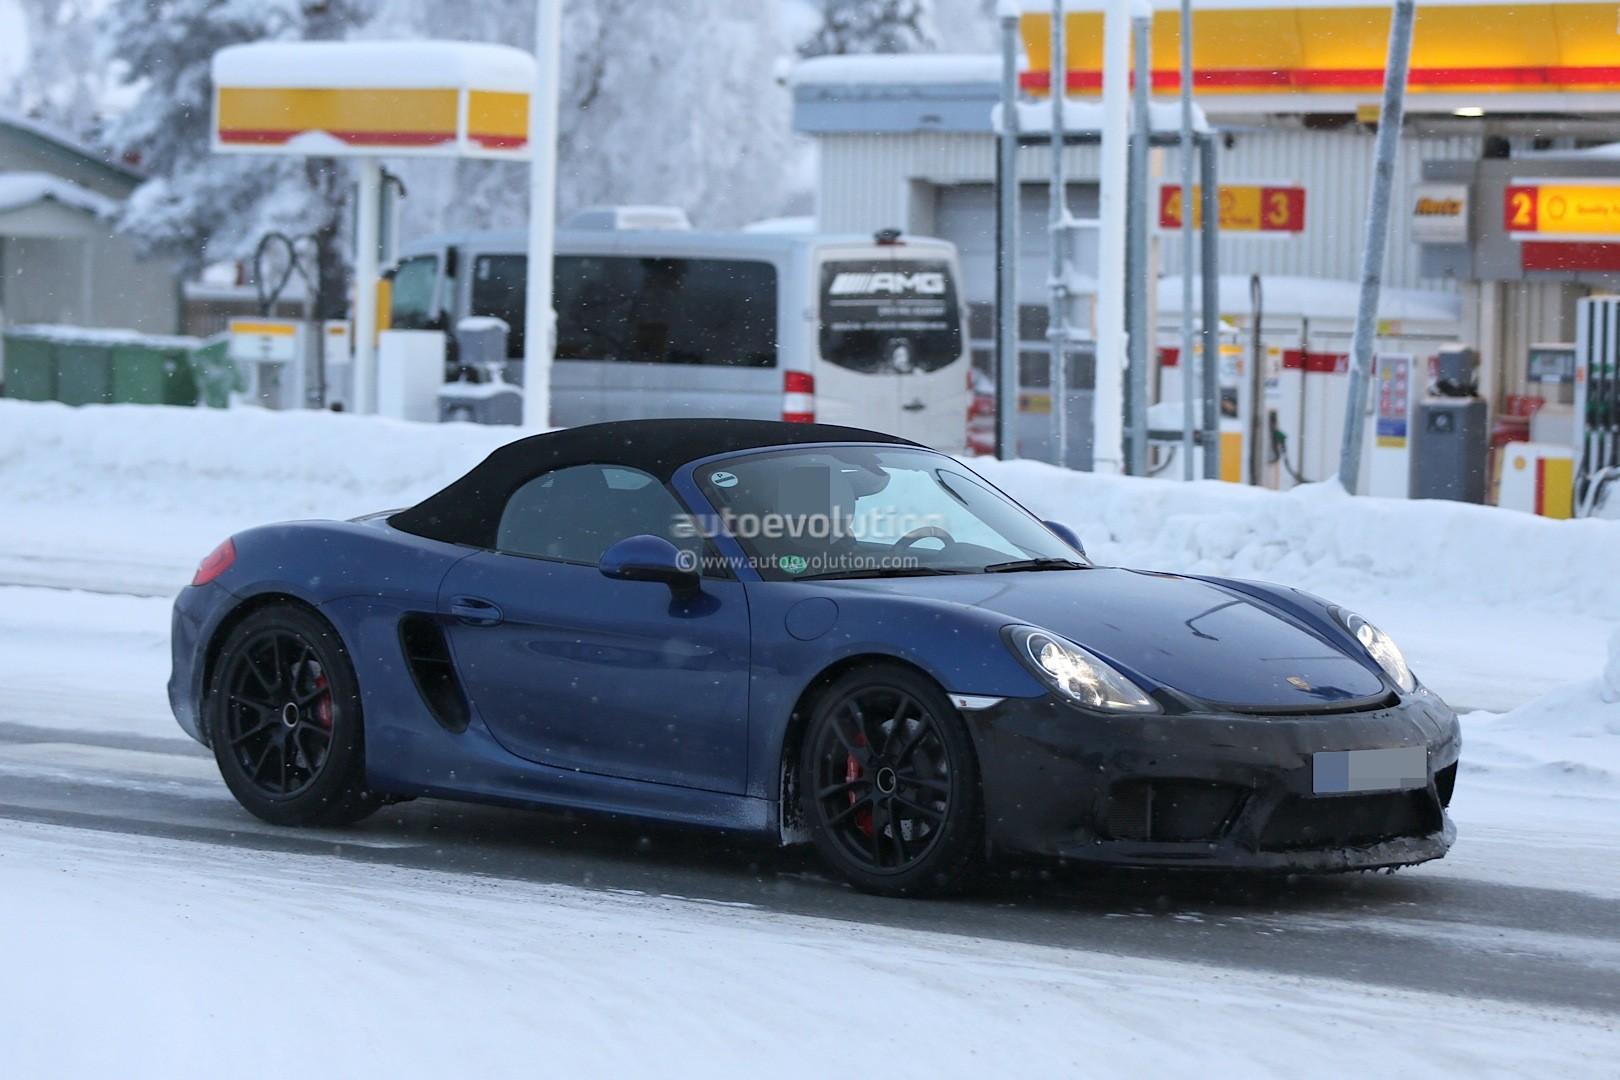 2016 - [Porsche] 718 Boxster & 718 Cayman [982] - Page 2 Spyshots-2016-porsche-boxster-rs-spyder-shows-ducktail-spoiler-aggressive-bumper_10